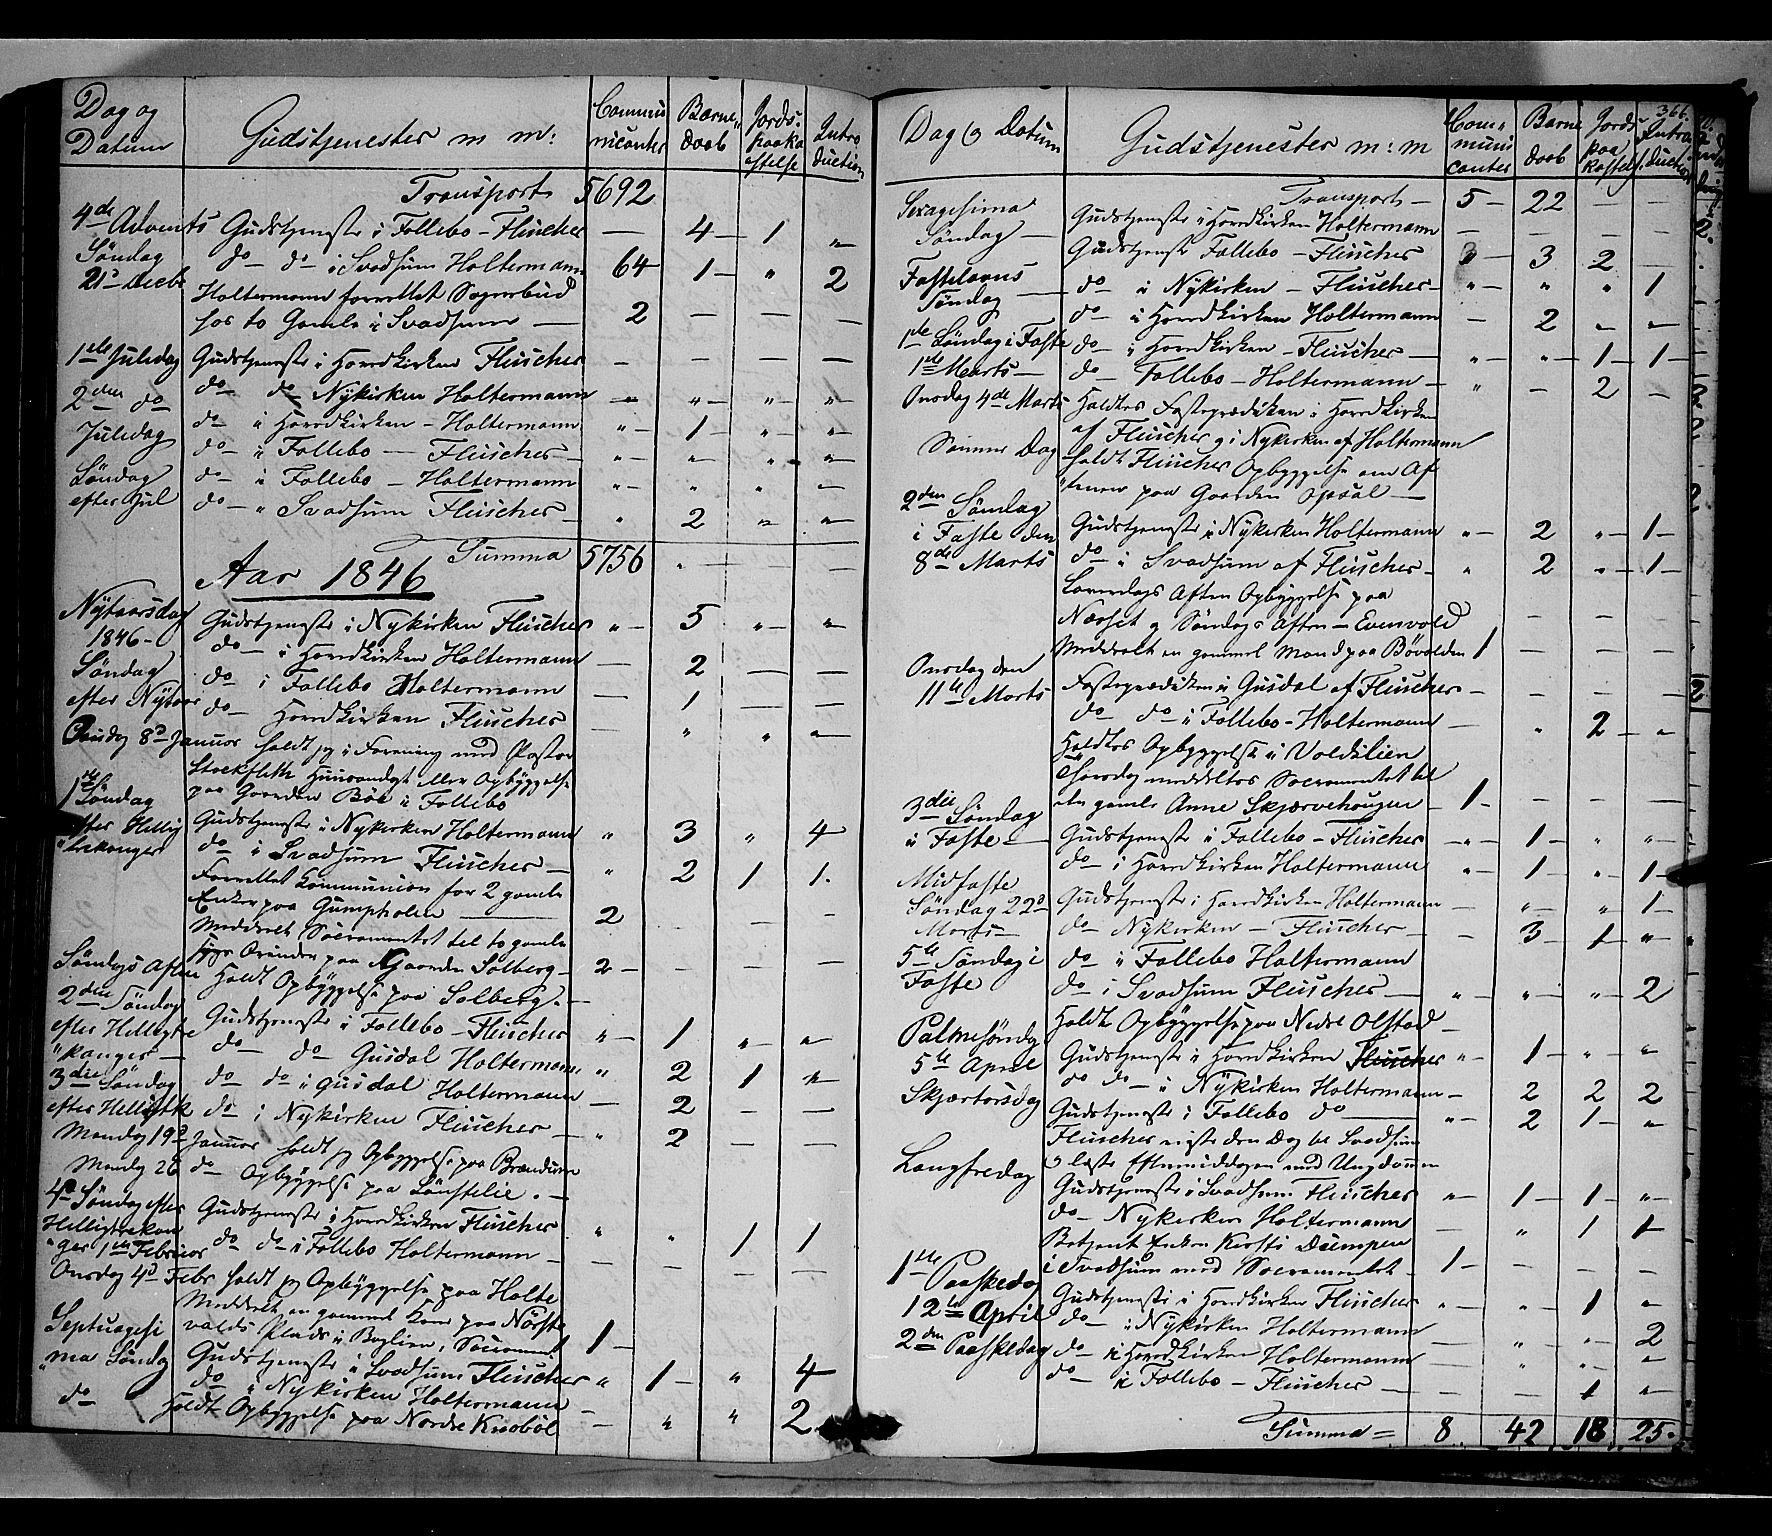 SAH, Gausdal prestekontor, Ministerialbok nr. 7, 1840-1850, s. 366